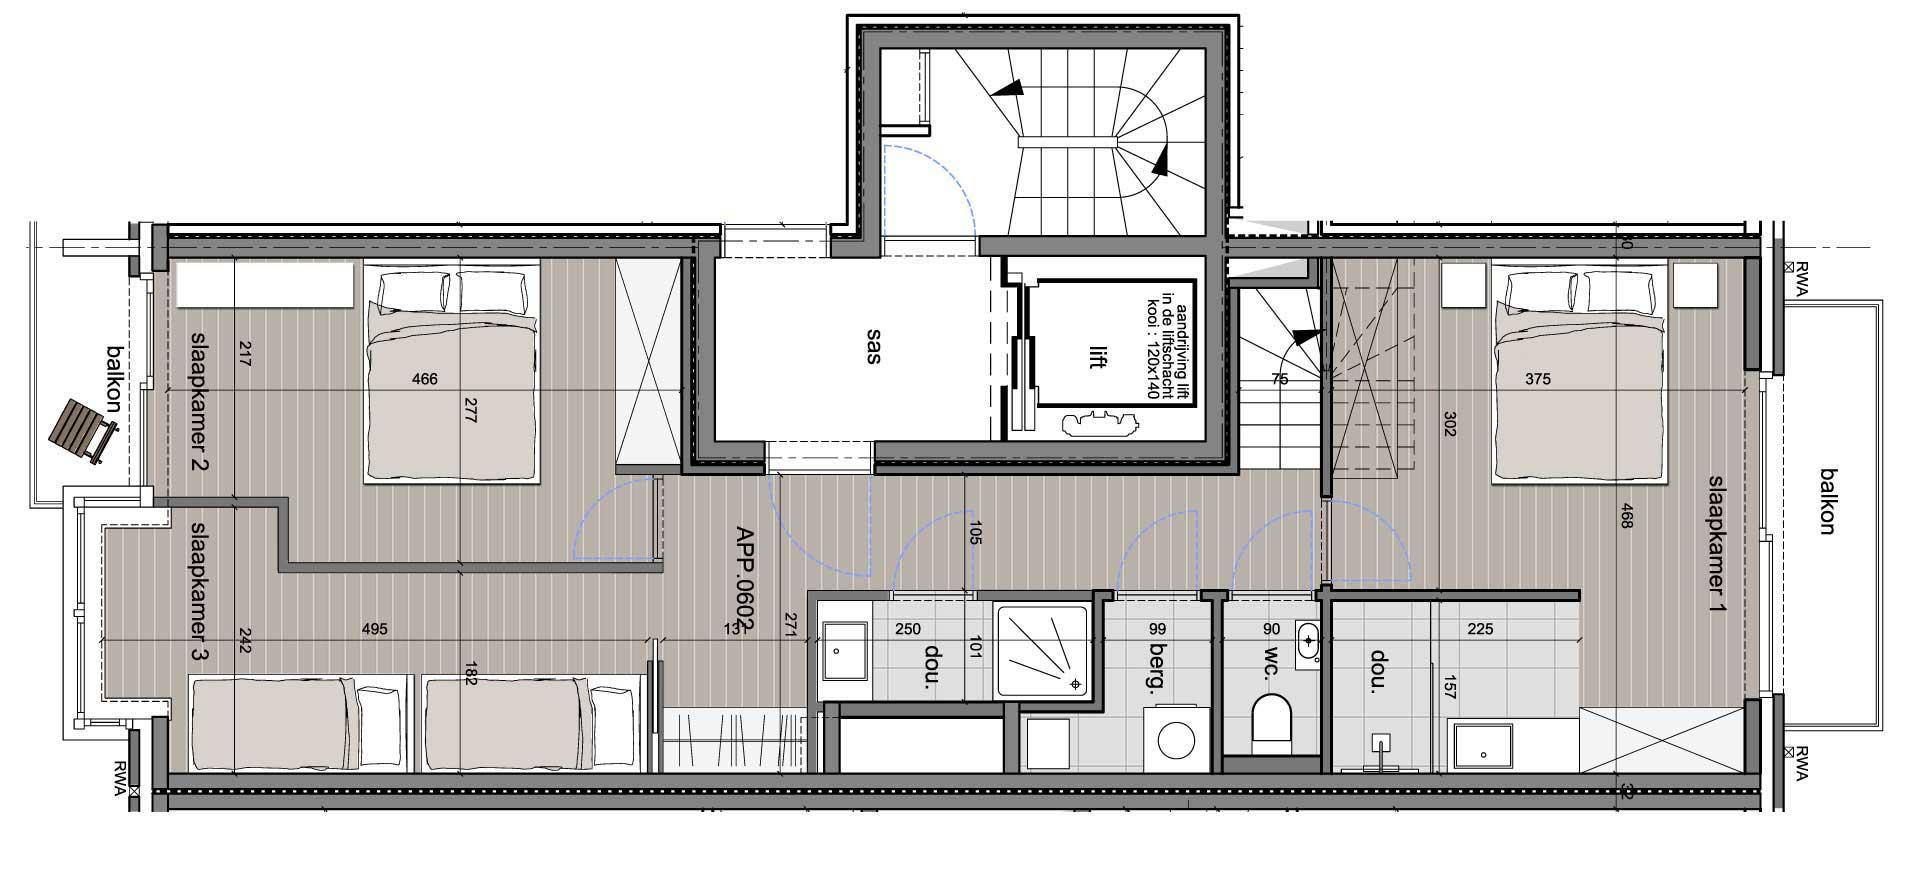 Residentie <br /> Winoc - image nieuwbouwappartement-koksijde-residentie-winoc-6.2.1 on https://hoprom.be